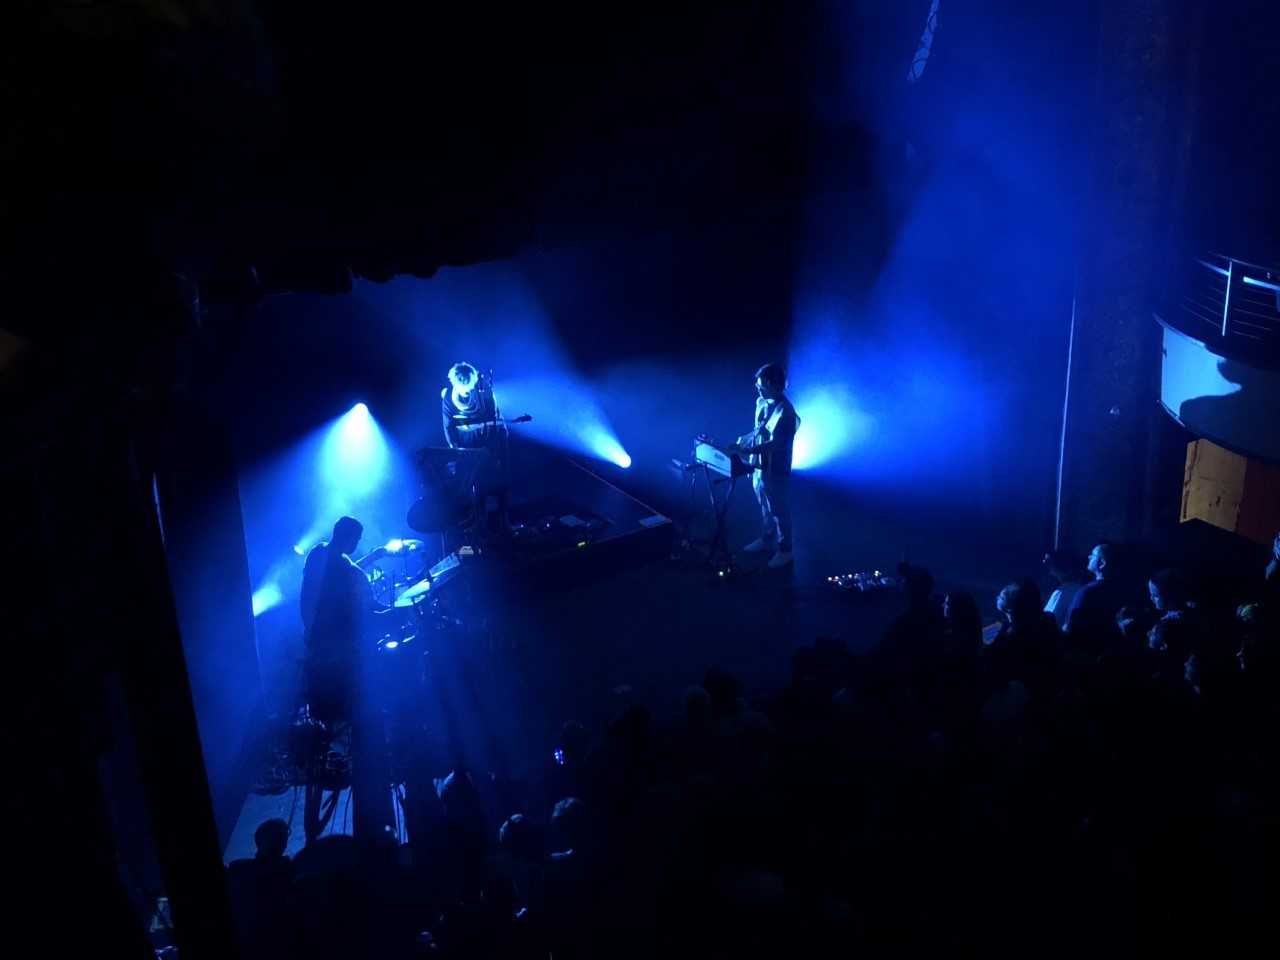 tUnE-yArDs/U.S. Girls Show Review